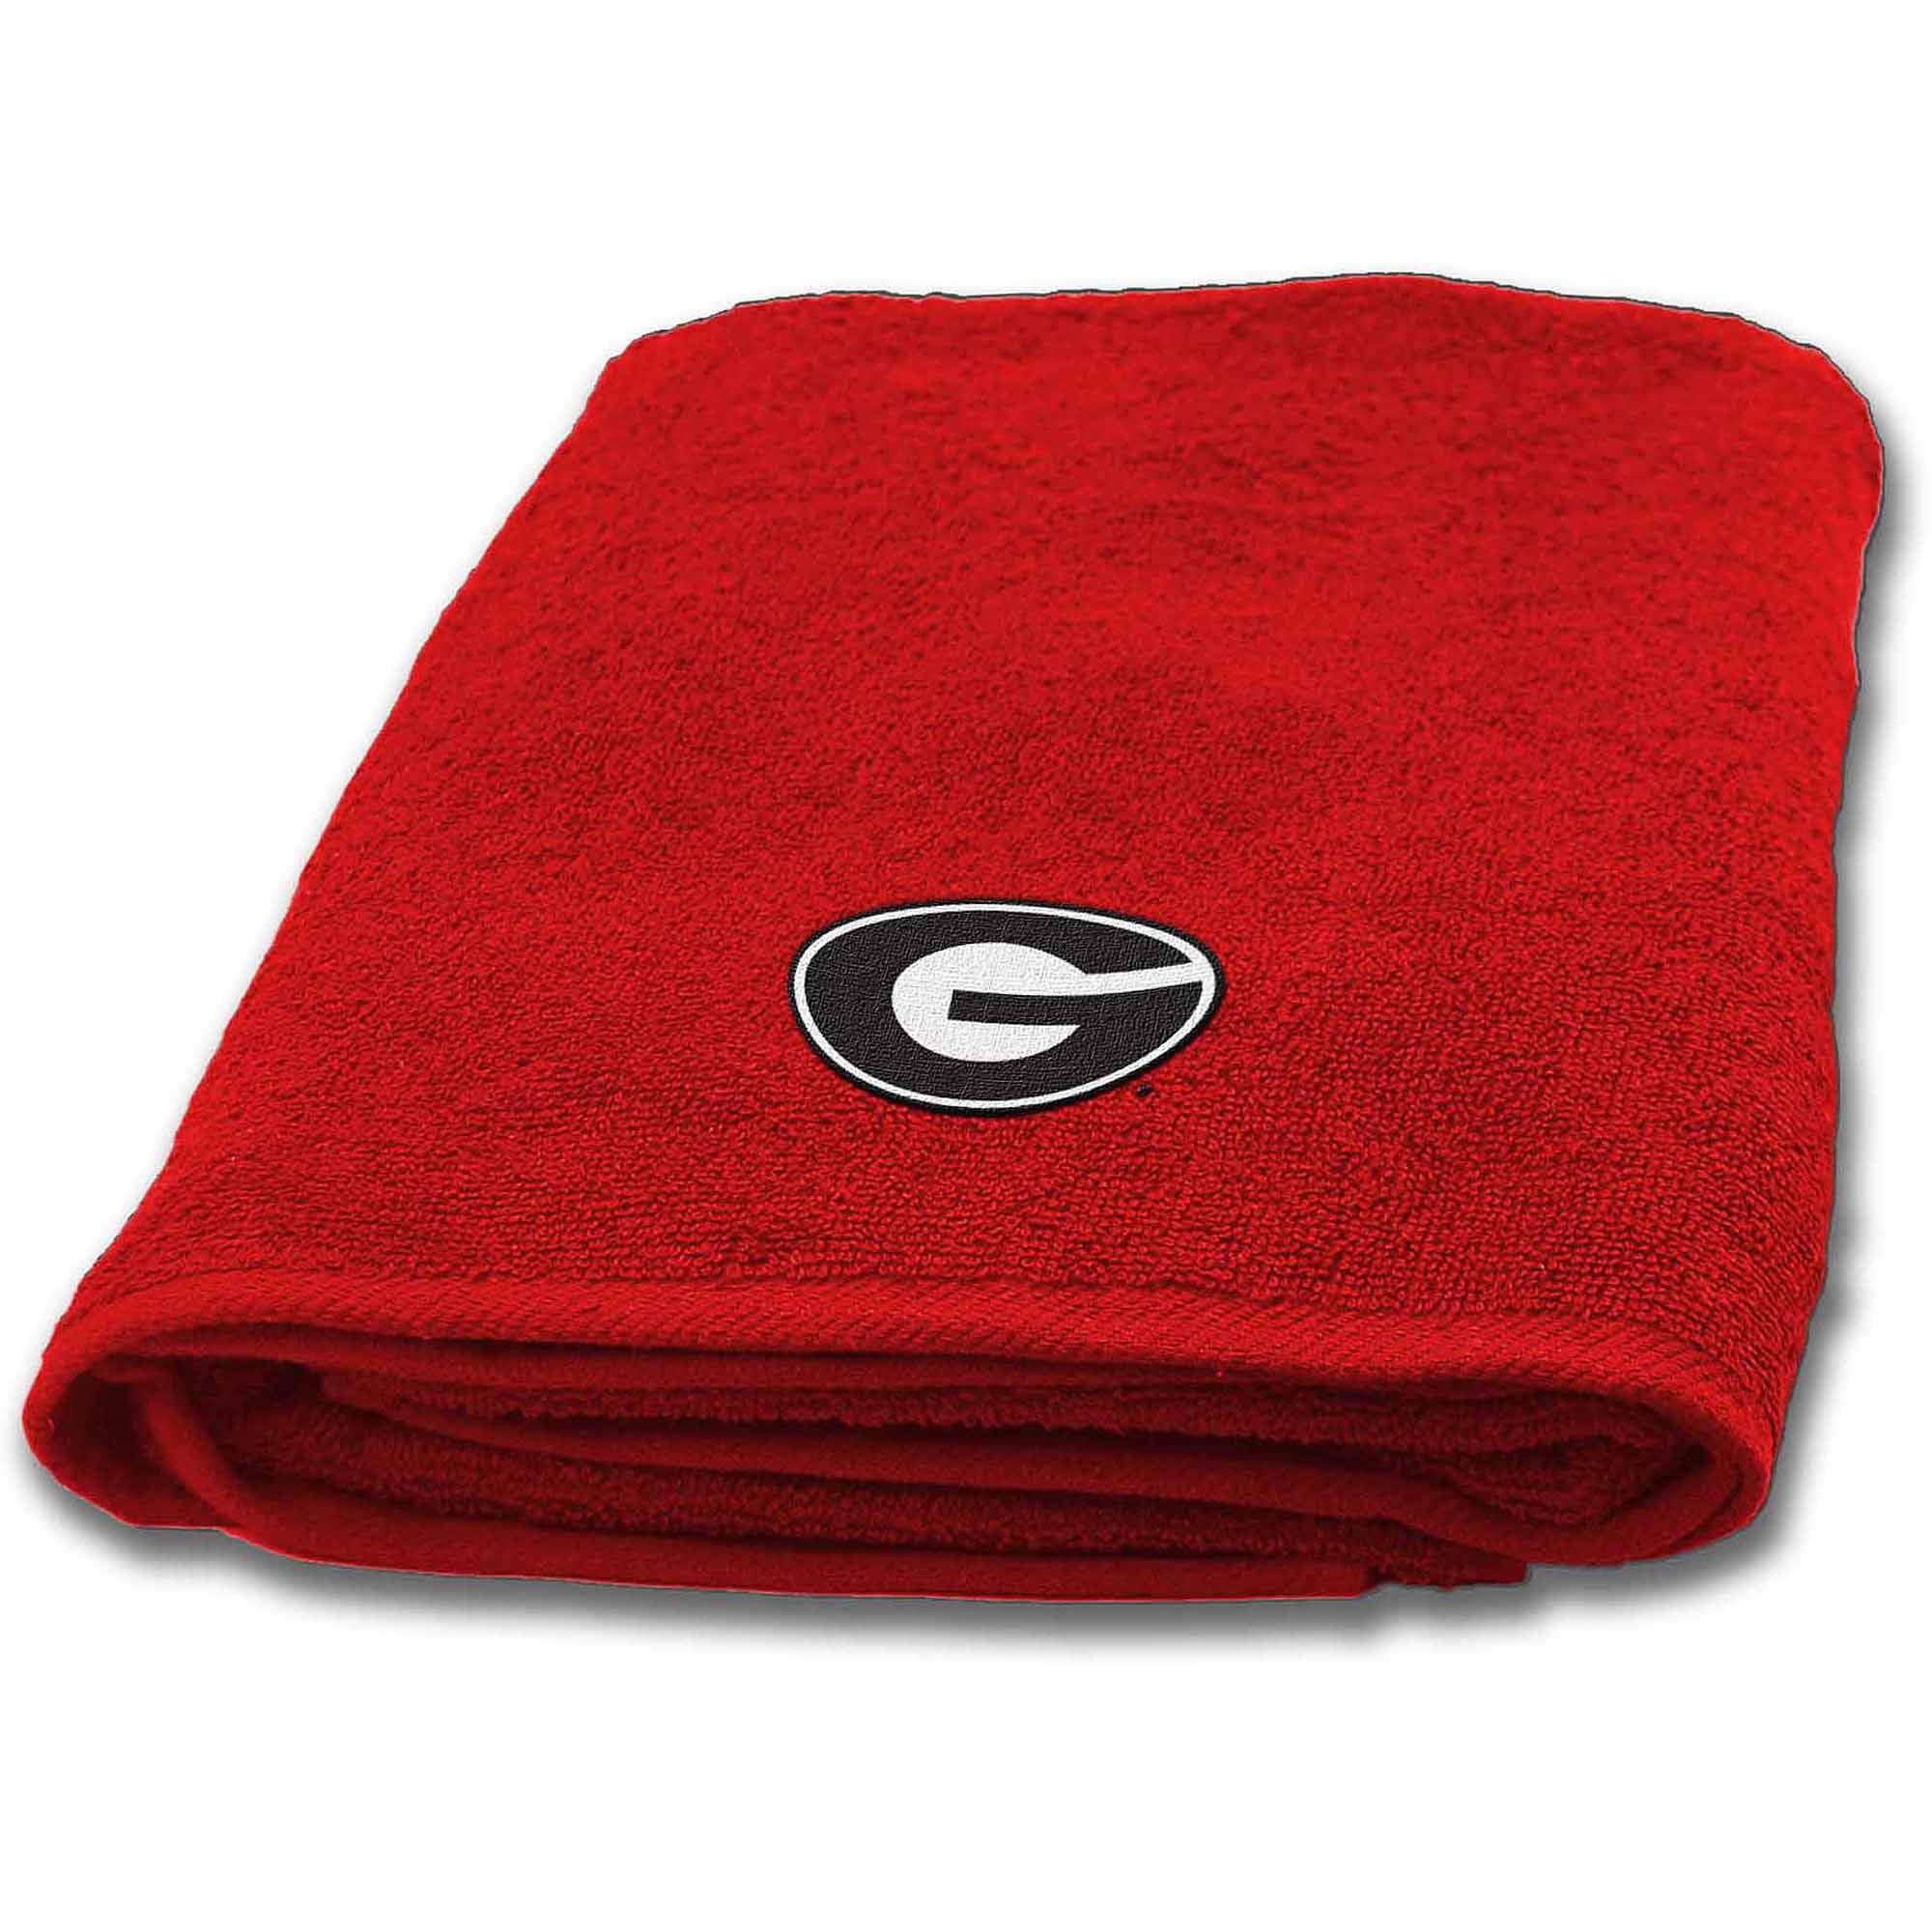 NCAA University of Georgia Bath Towel, 1 Each